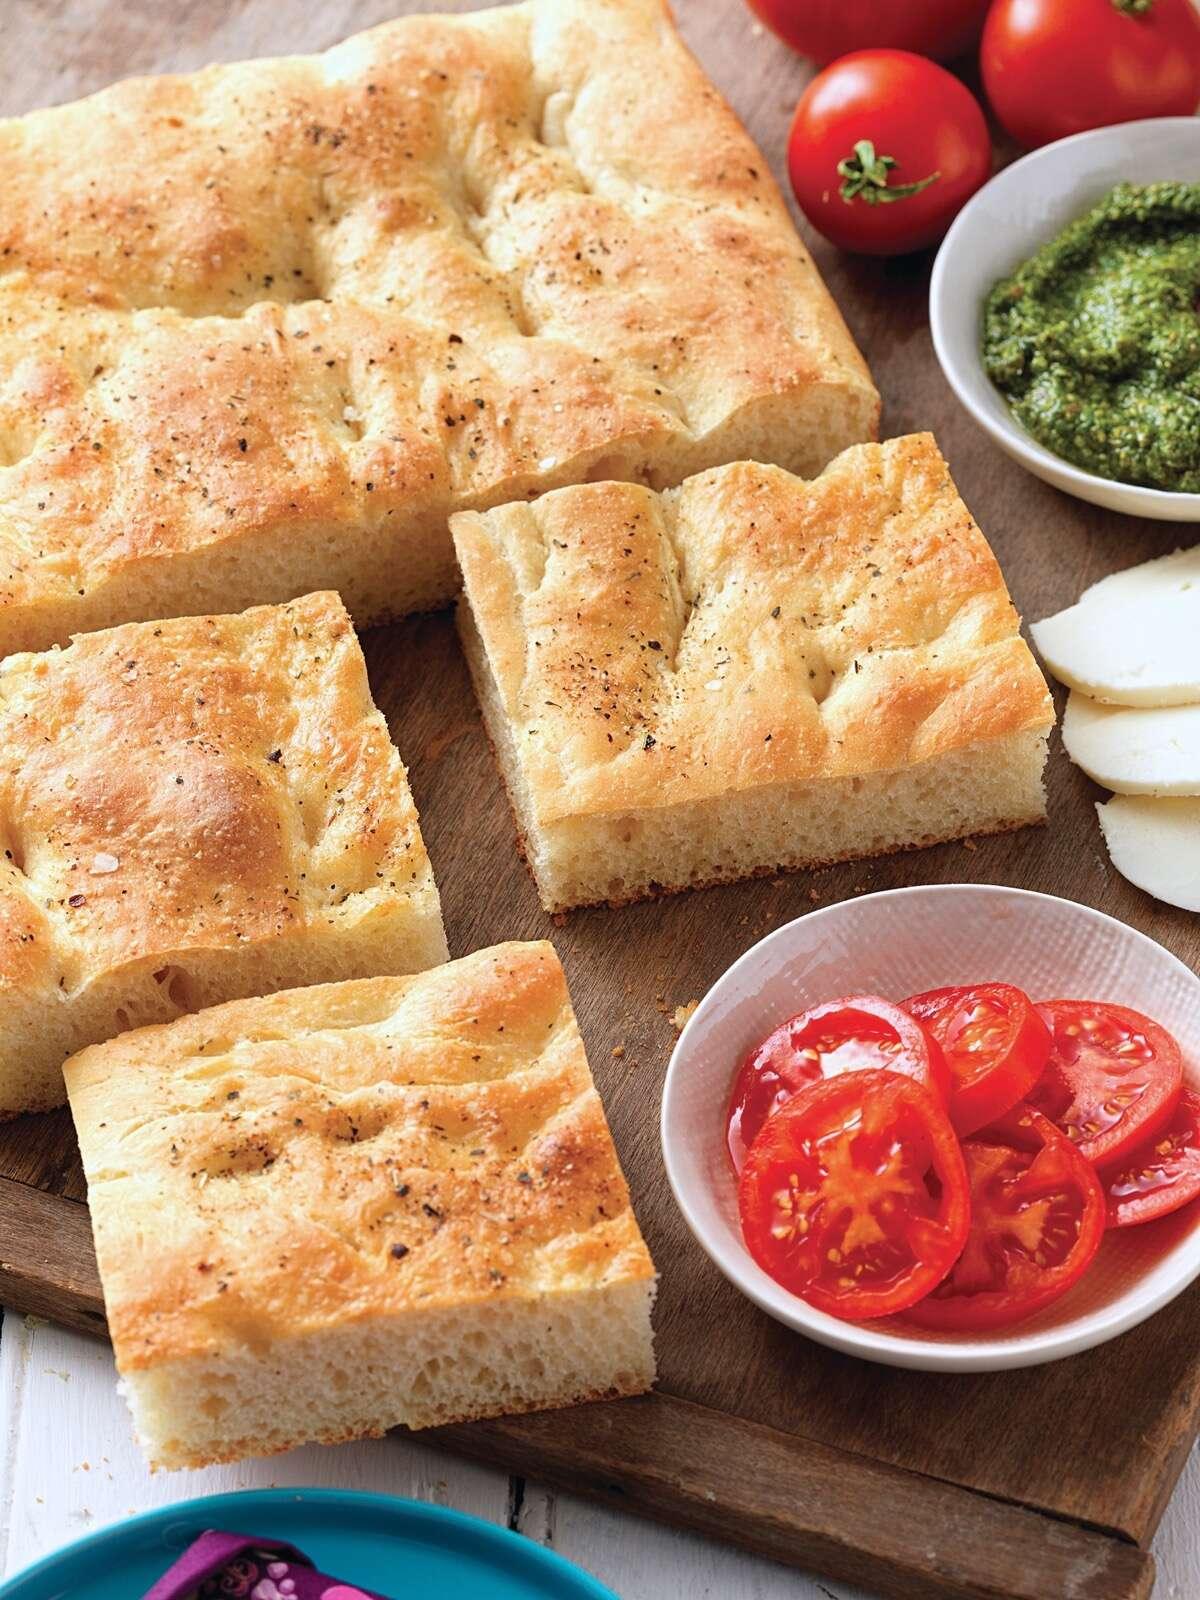 No-Fuss Focaccia cut into squares on a serving board with tomato, pesto, and mozzarella on the side.